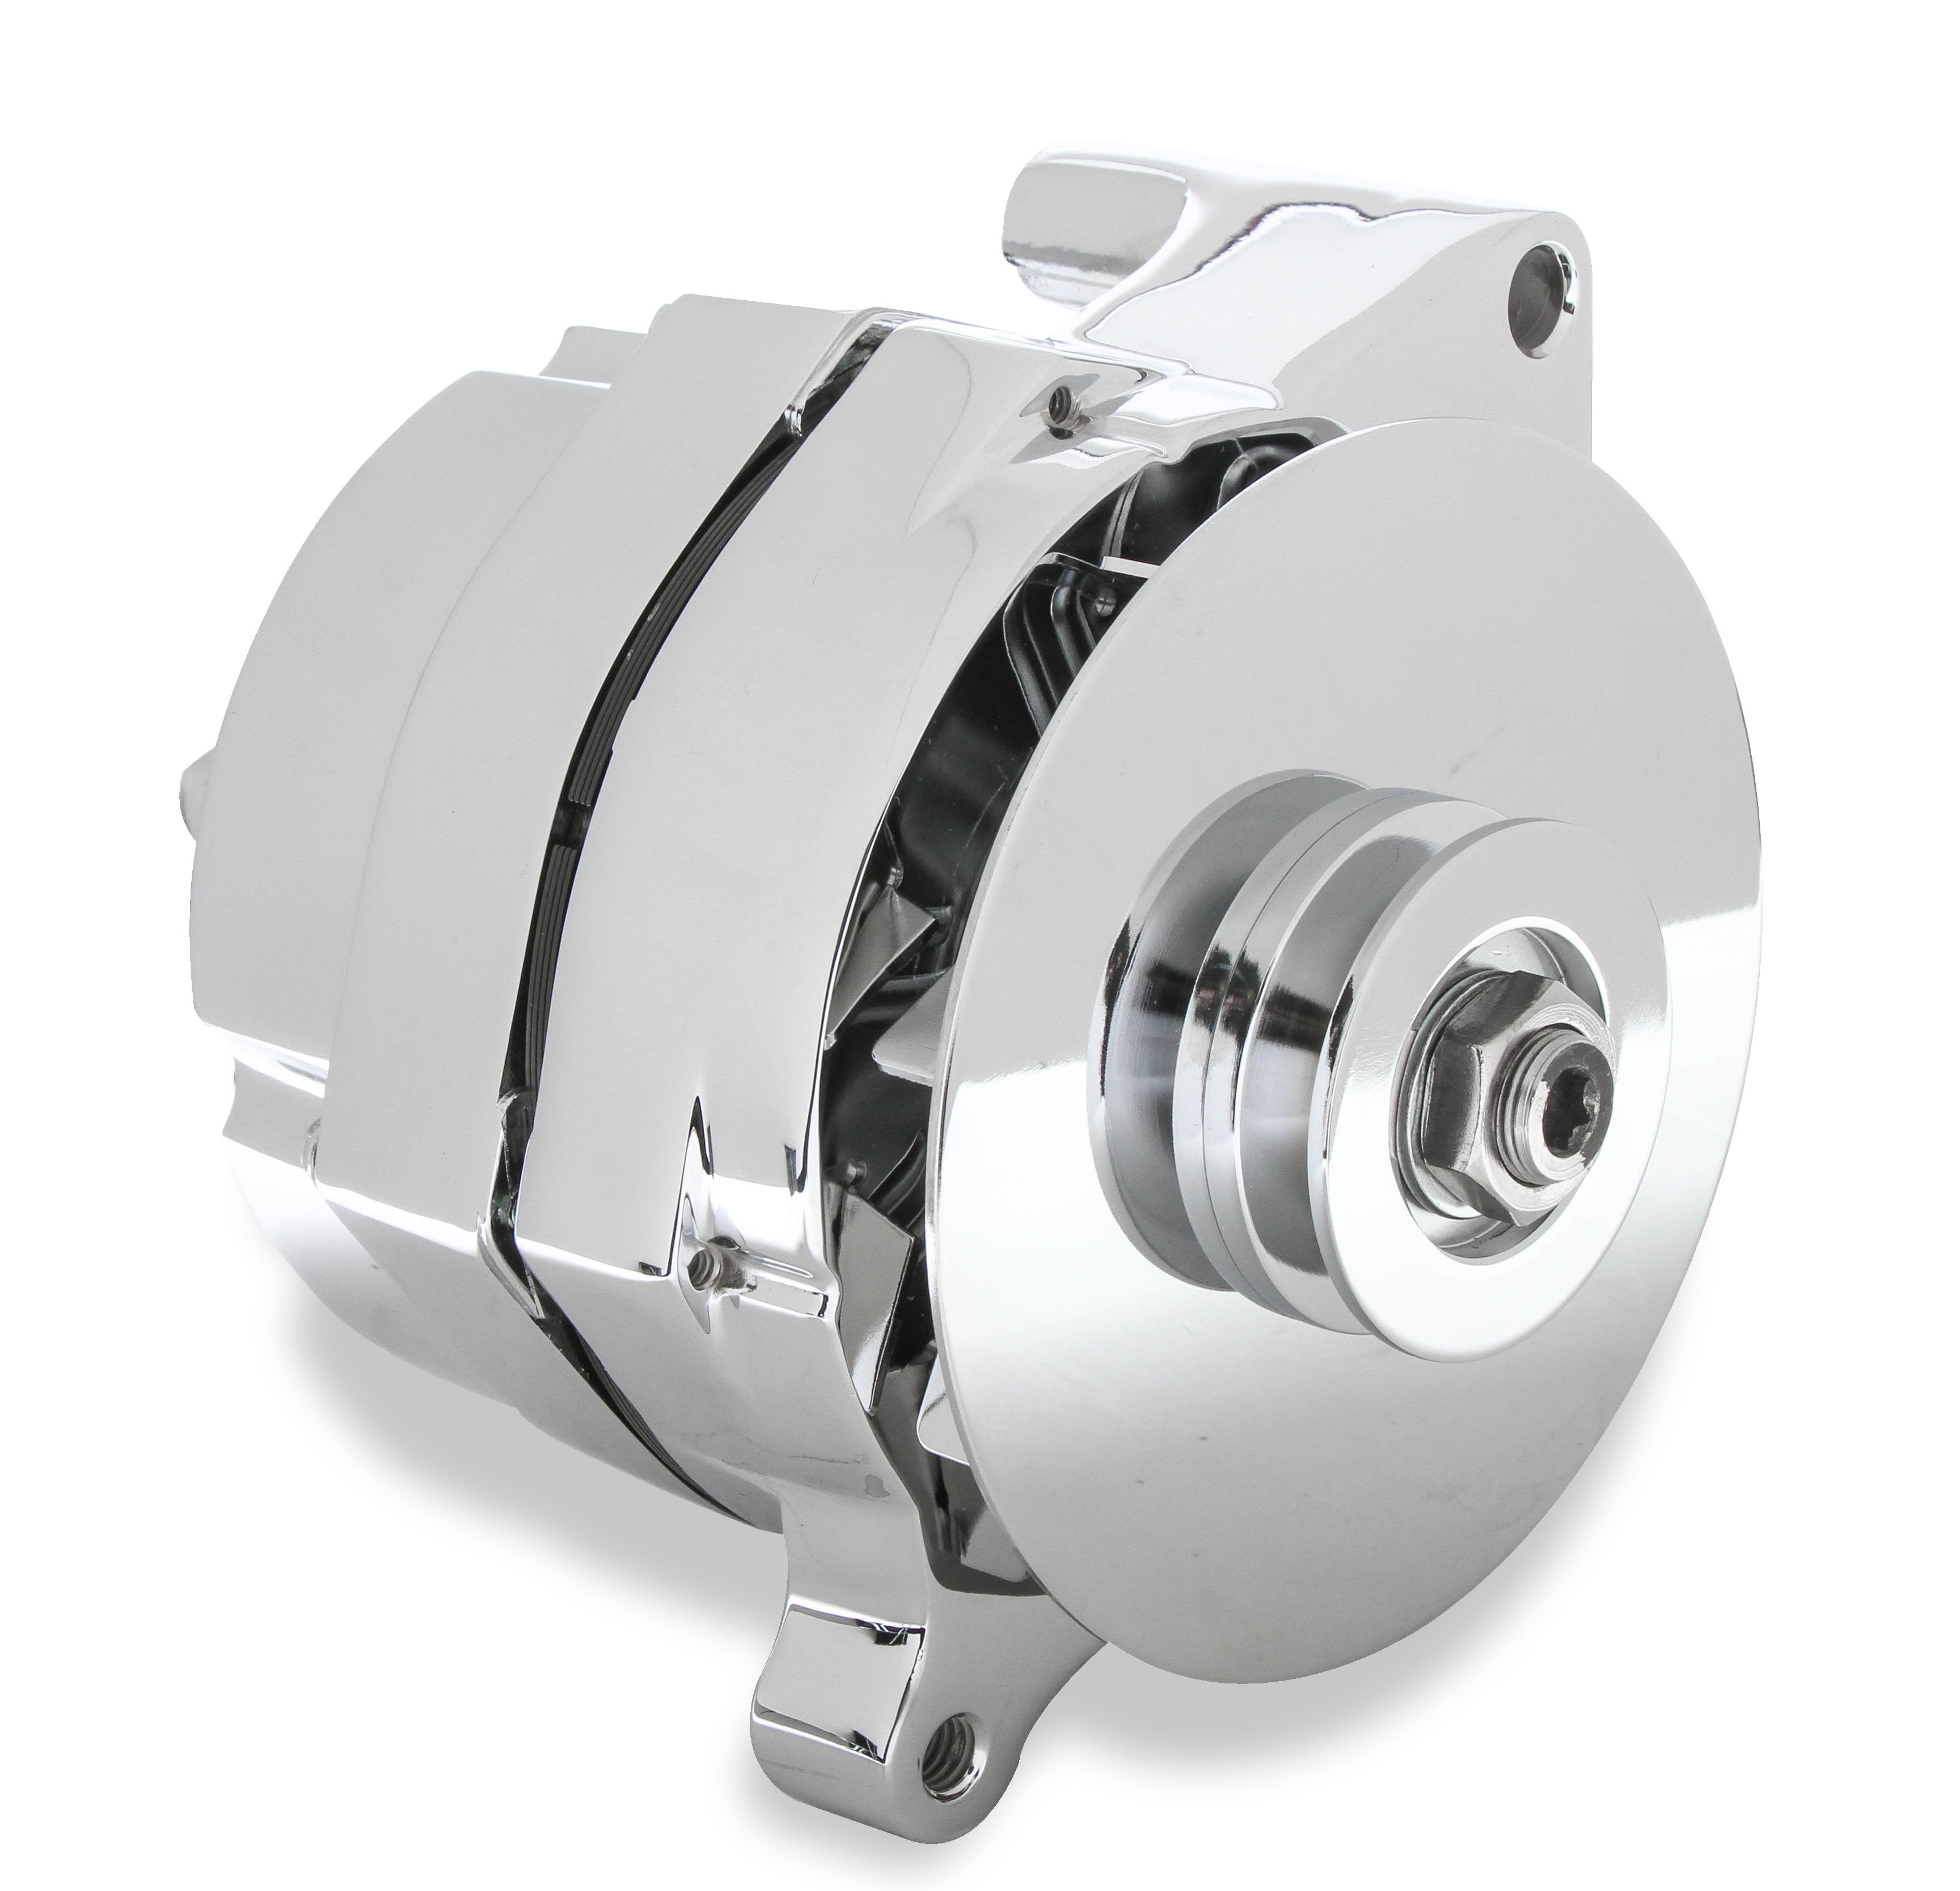 Gasket 5185 Chrome Plated Alternator Bracket Mr